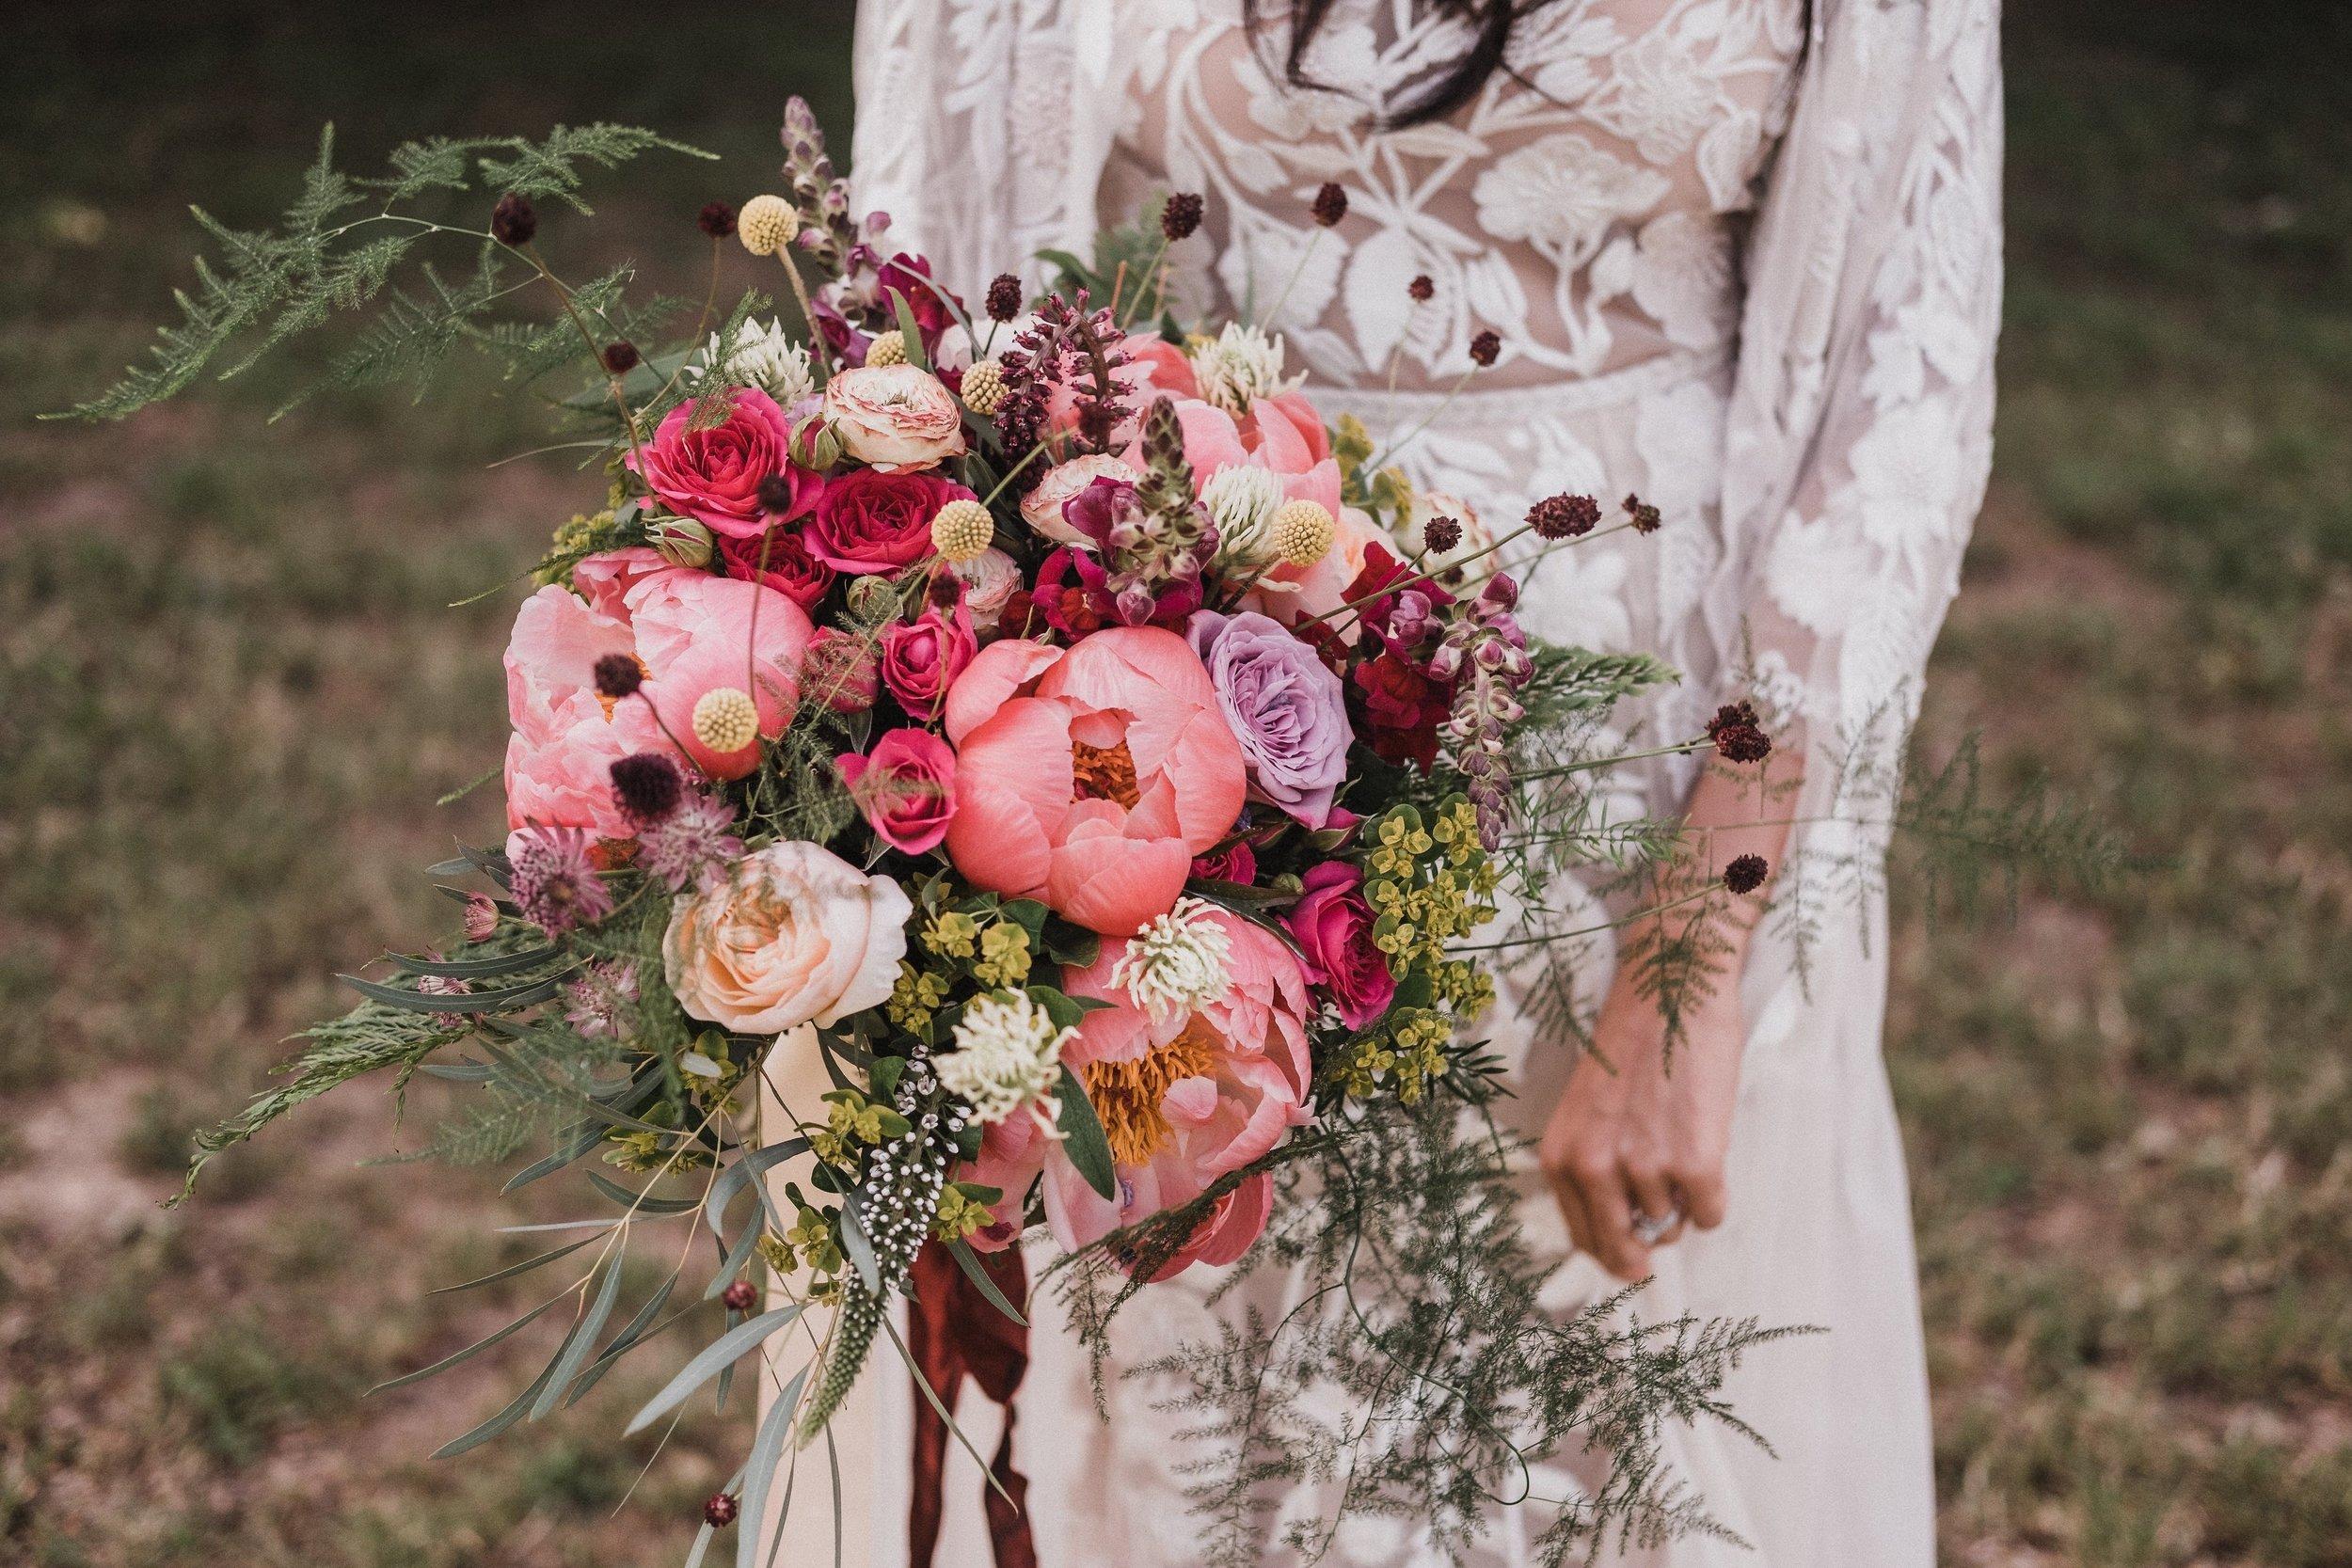 Wild, romantic bridal bouquet at Lila's Wood, hertfordshire